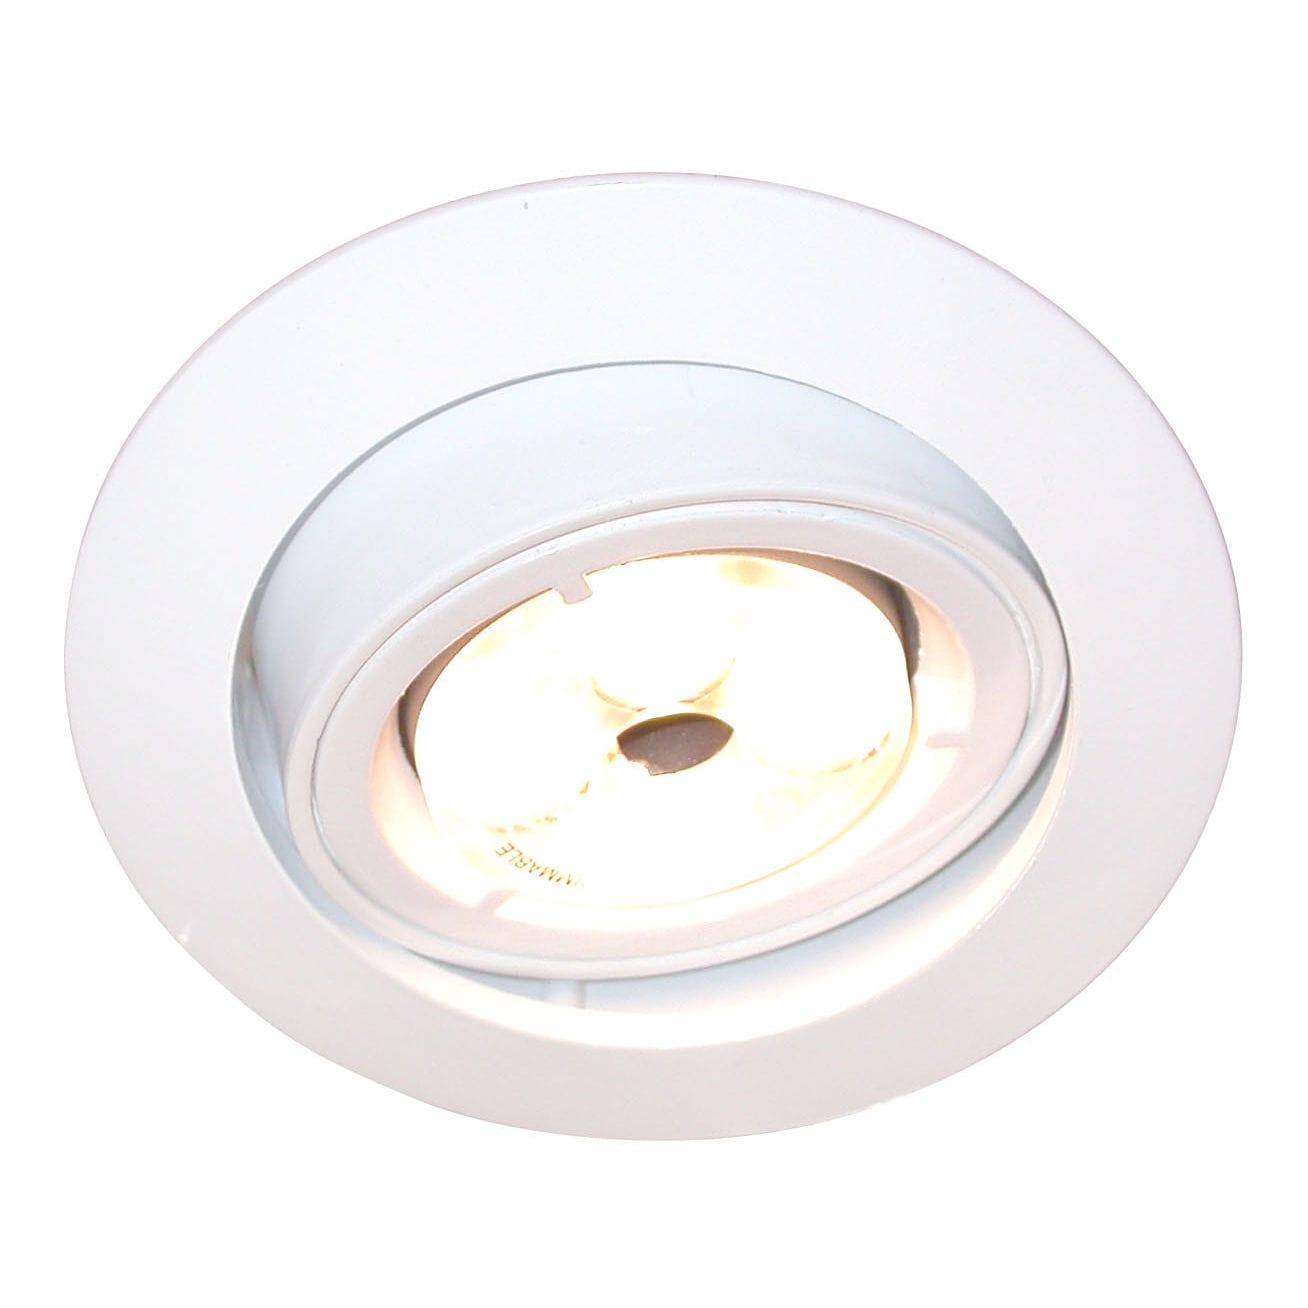 Recessed light fixture hid halogen led sisko holight recessed light fixture hid halogen led sisko aloadofball Choice Image